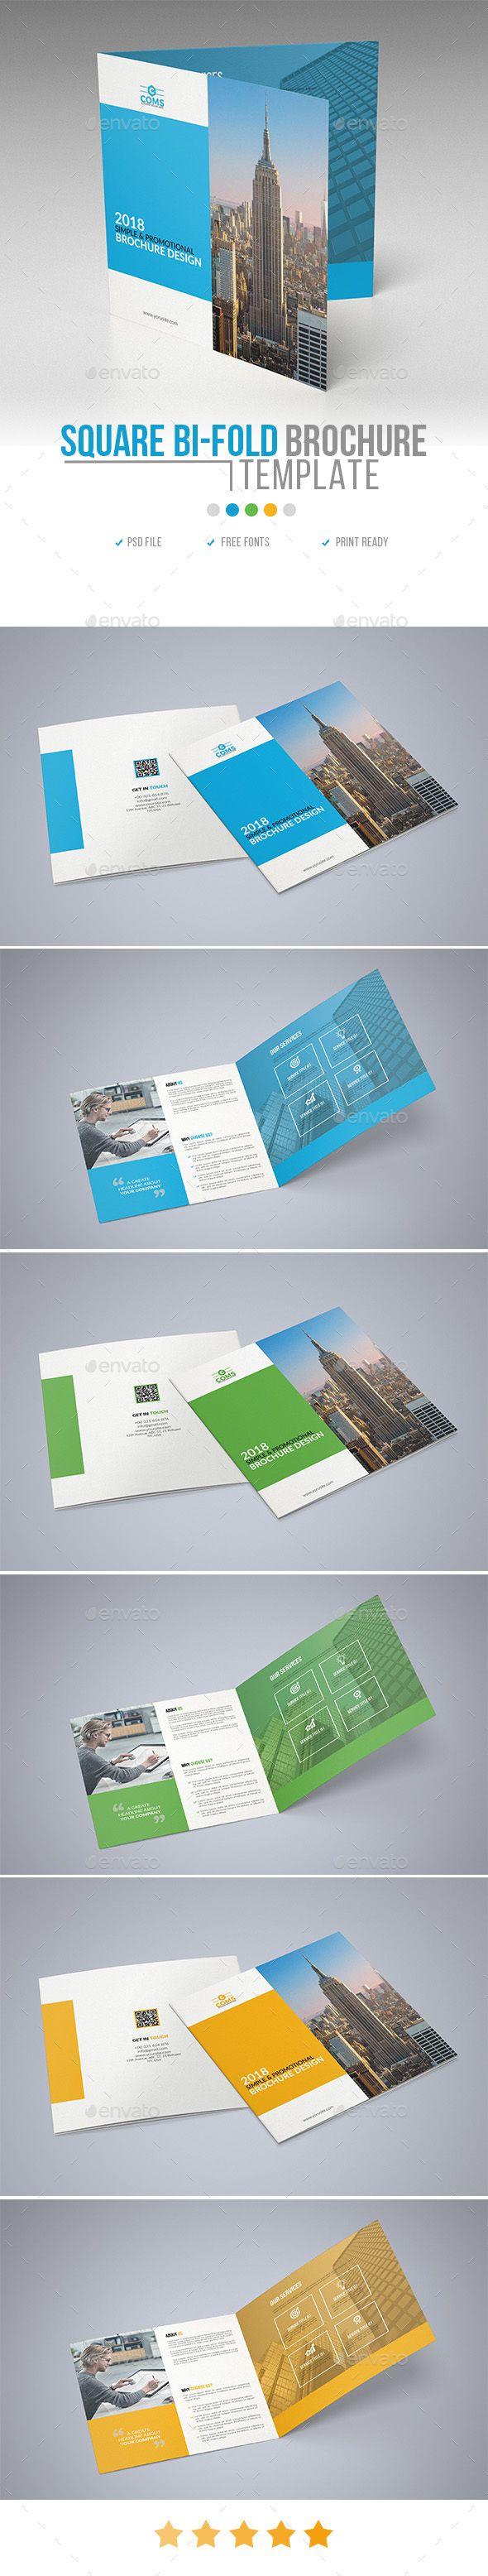 The Best Bi Fold Brochure Ideas On Pinterest Tri Fold - Free bi fold brochure template